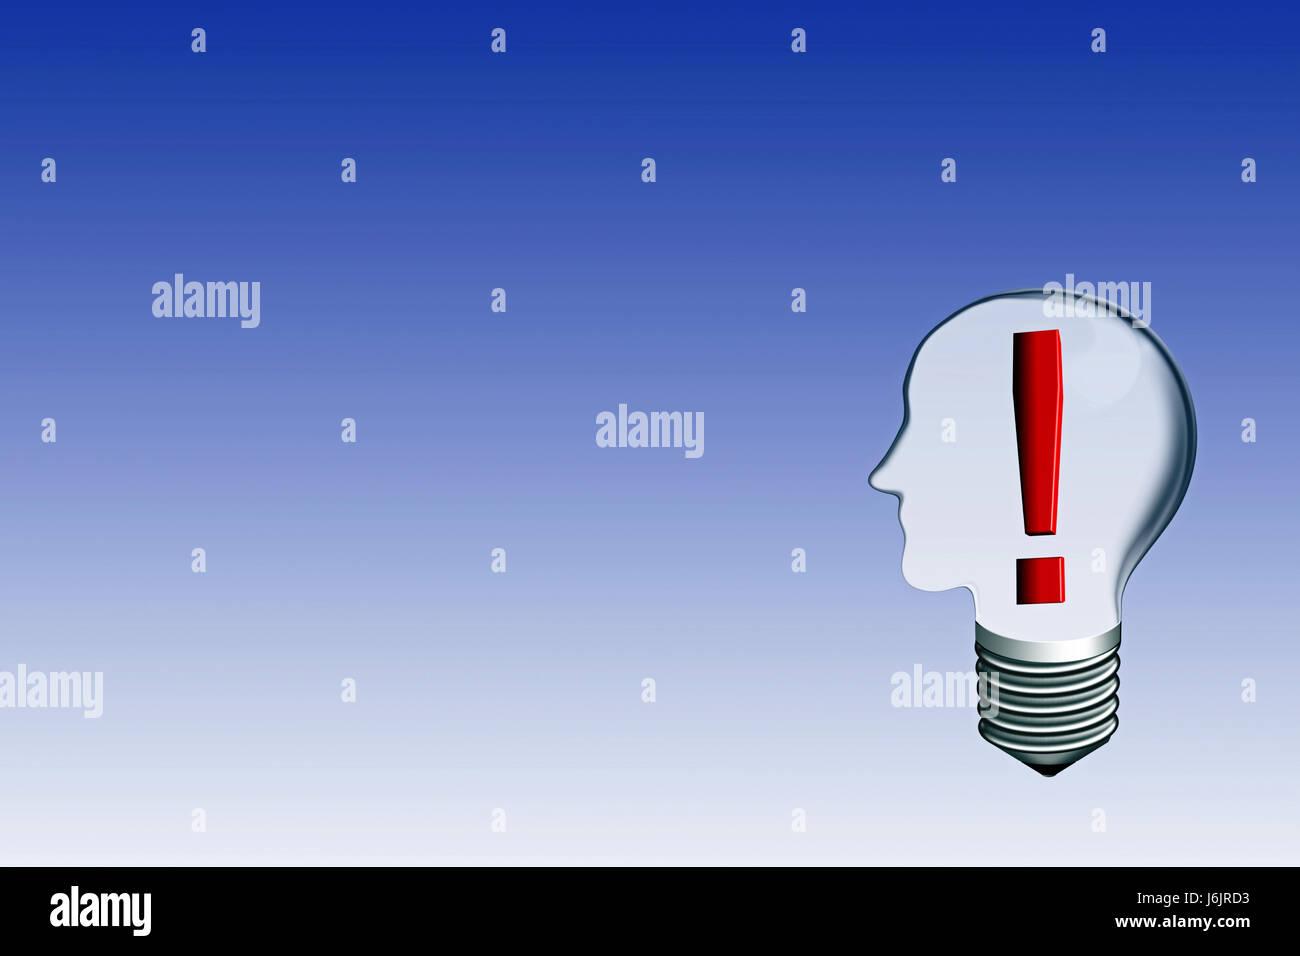 science think thoughts brainwave intelligence opening foundation inspiration Stock Photo